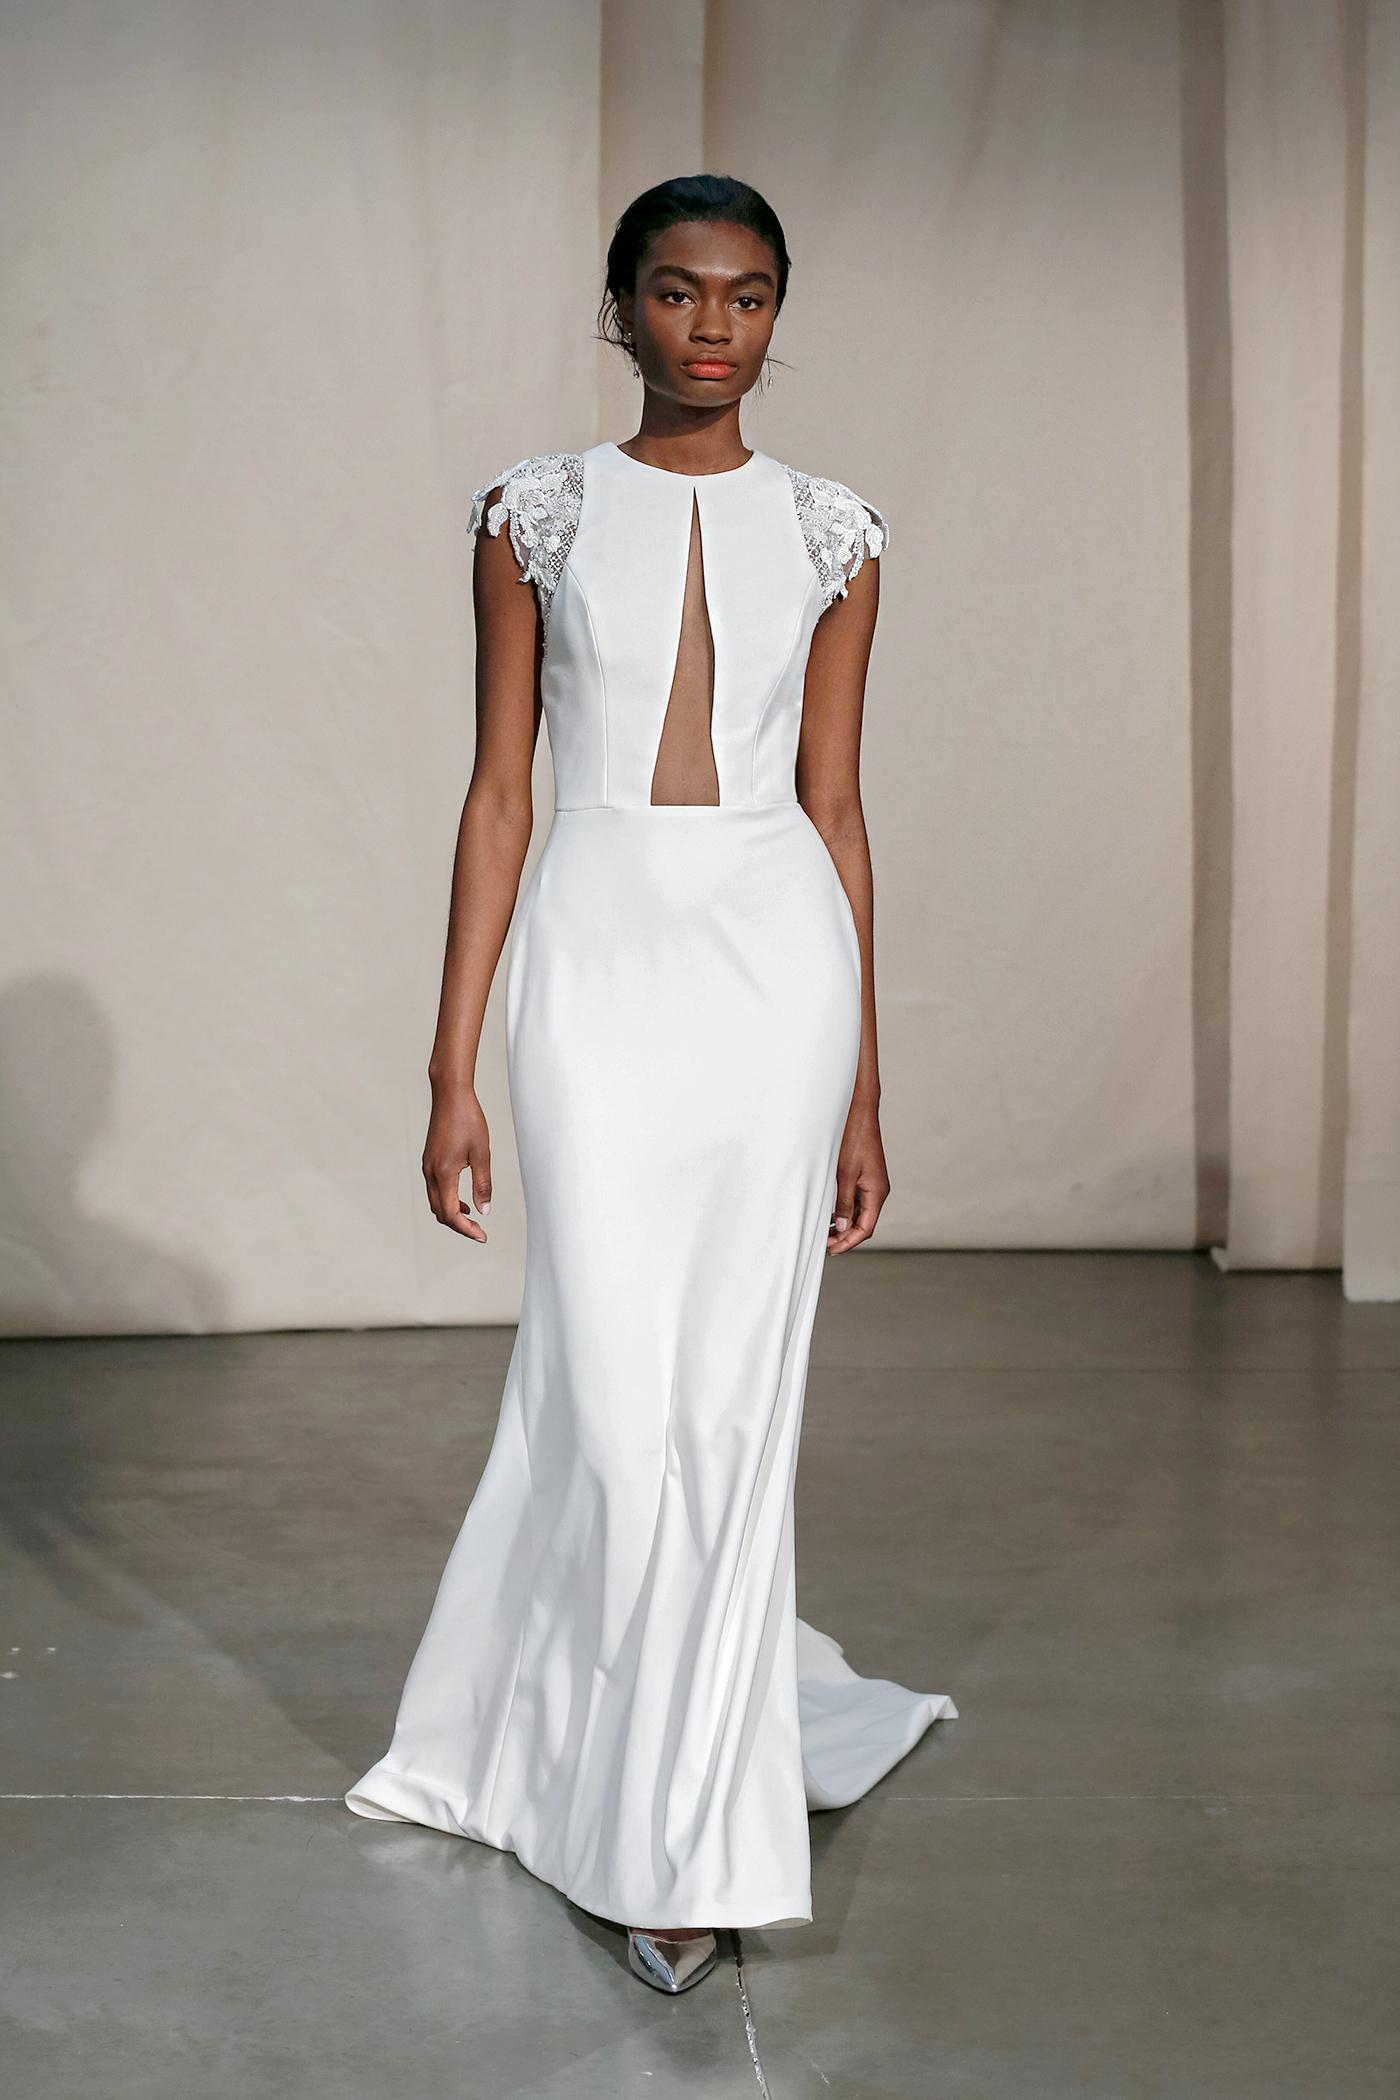 justin alexander cap-sleeved cut-out bodice wedding dress spring 2020